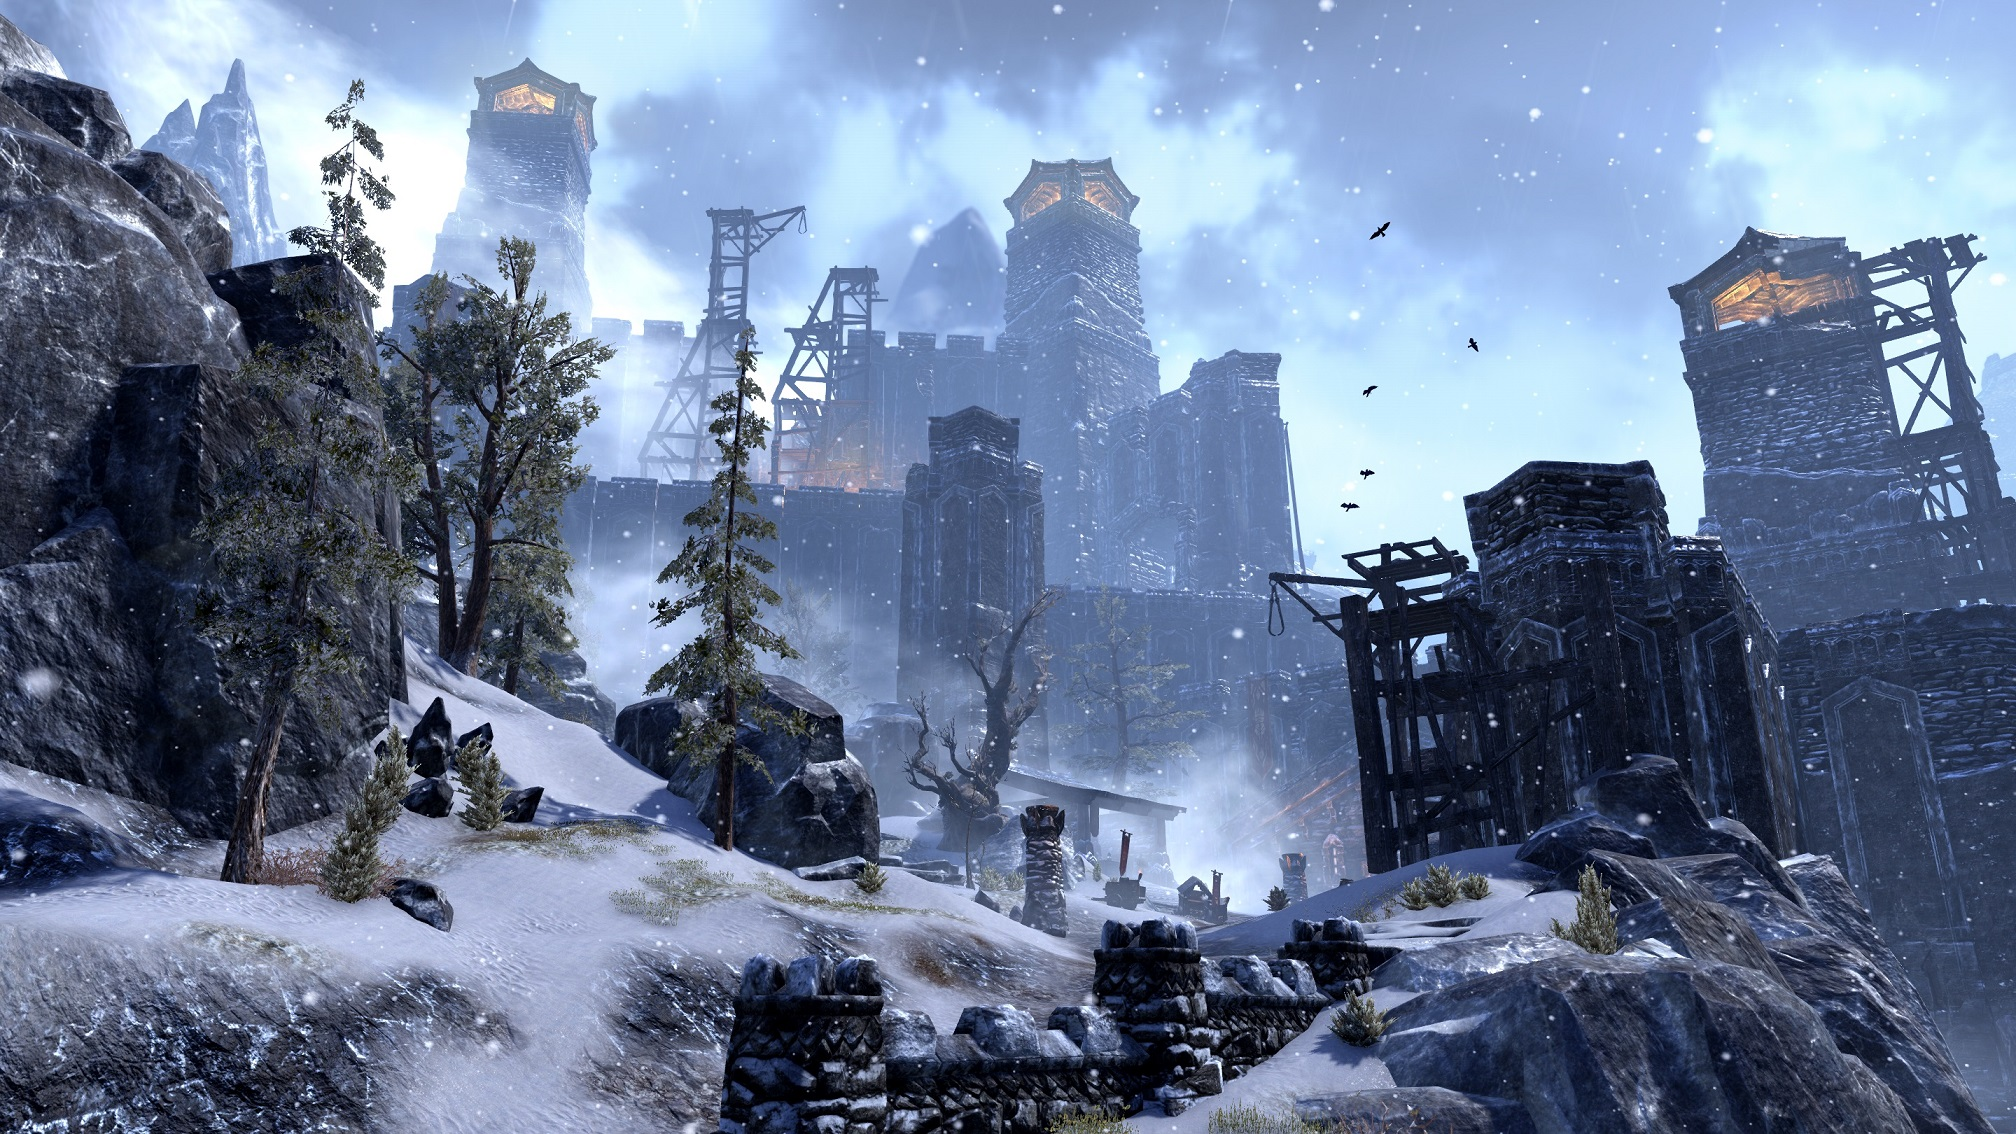 Elder Scrolls Online Tamriel Unlimited Screenshot Wrothgarian Mountains Towers of Orsinium Rise Anew